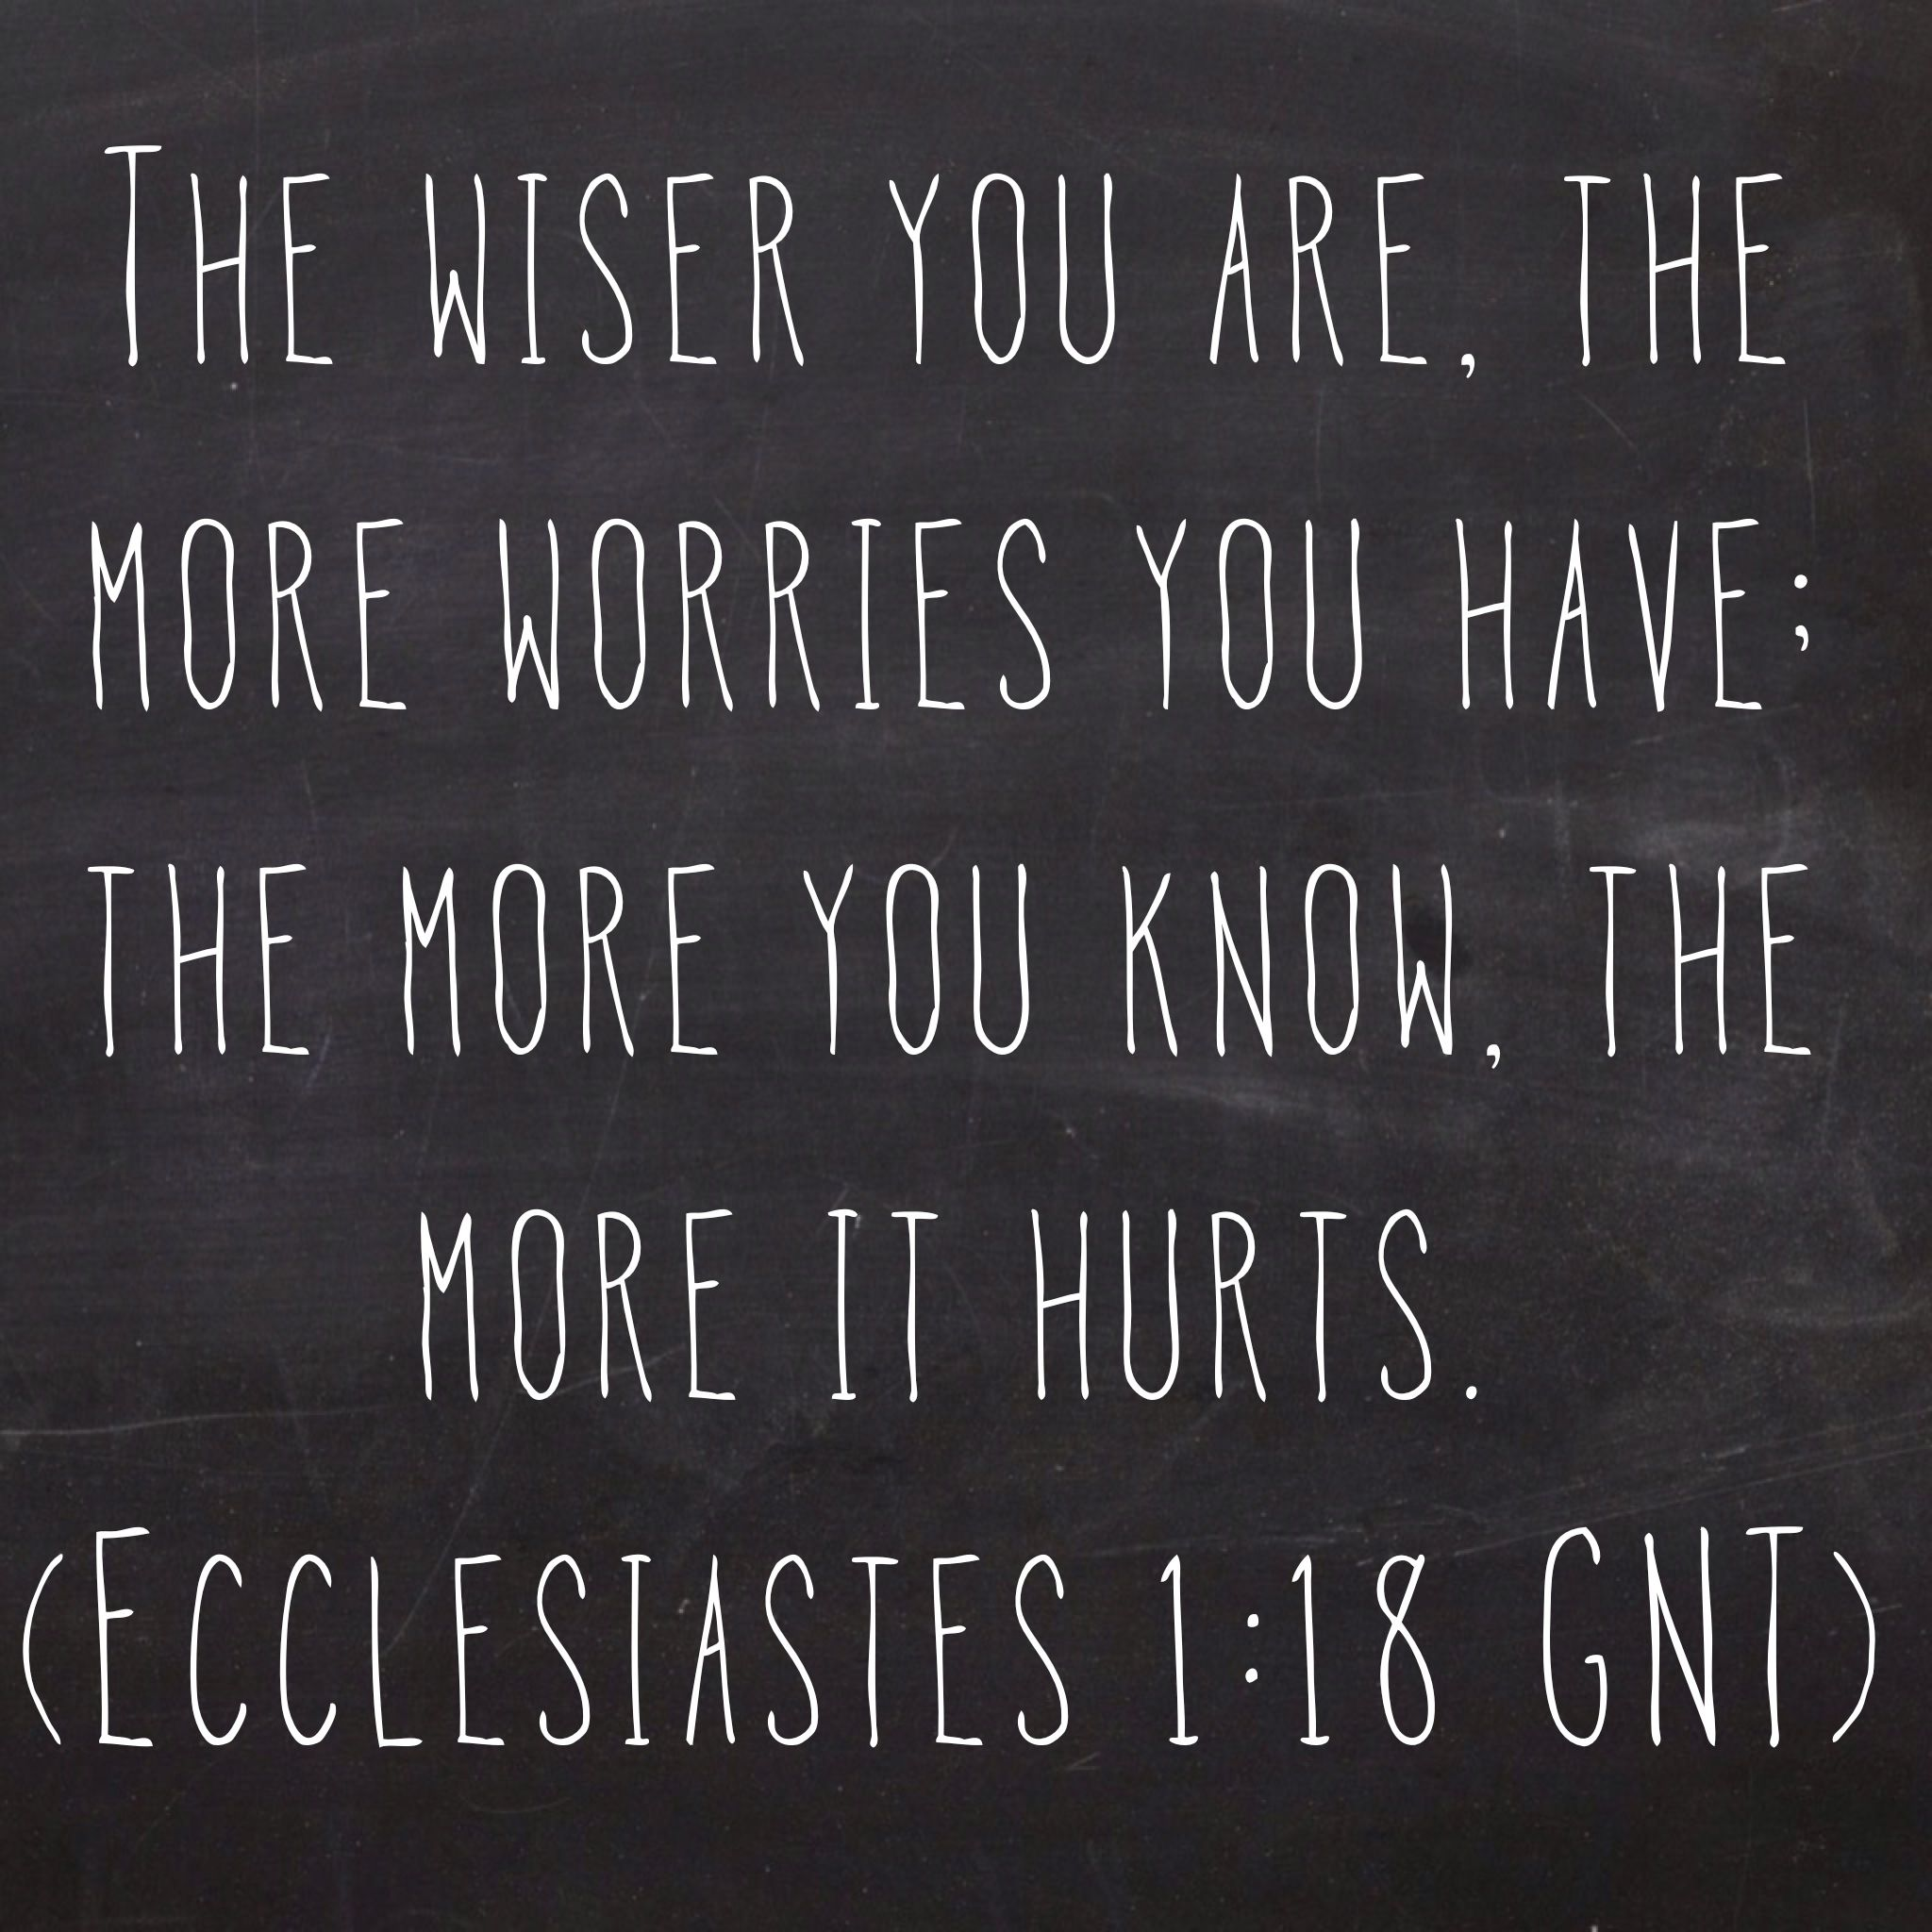 Image Result For Ecclesiastes 1 18